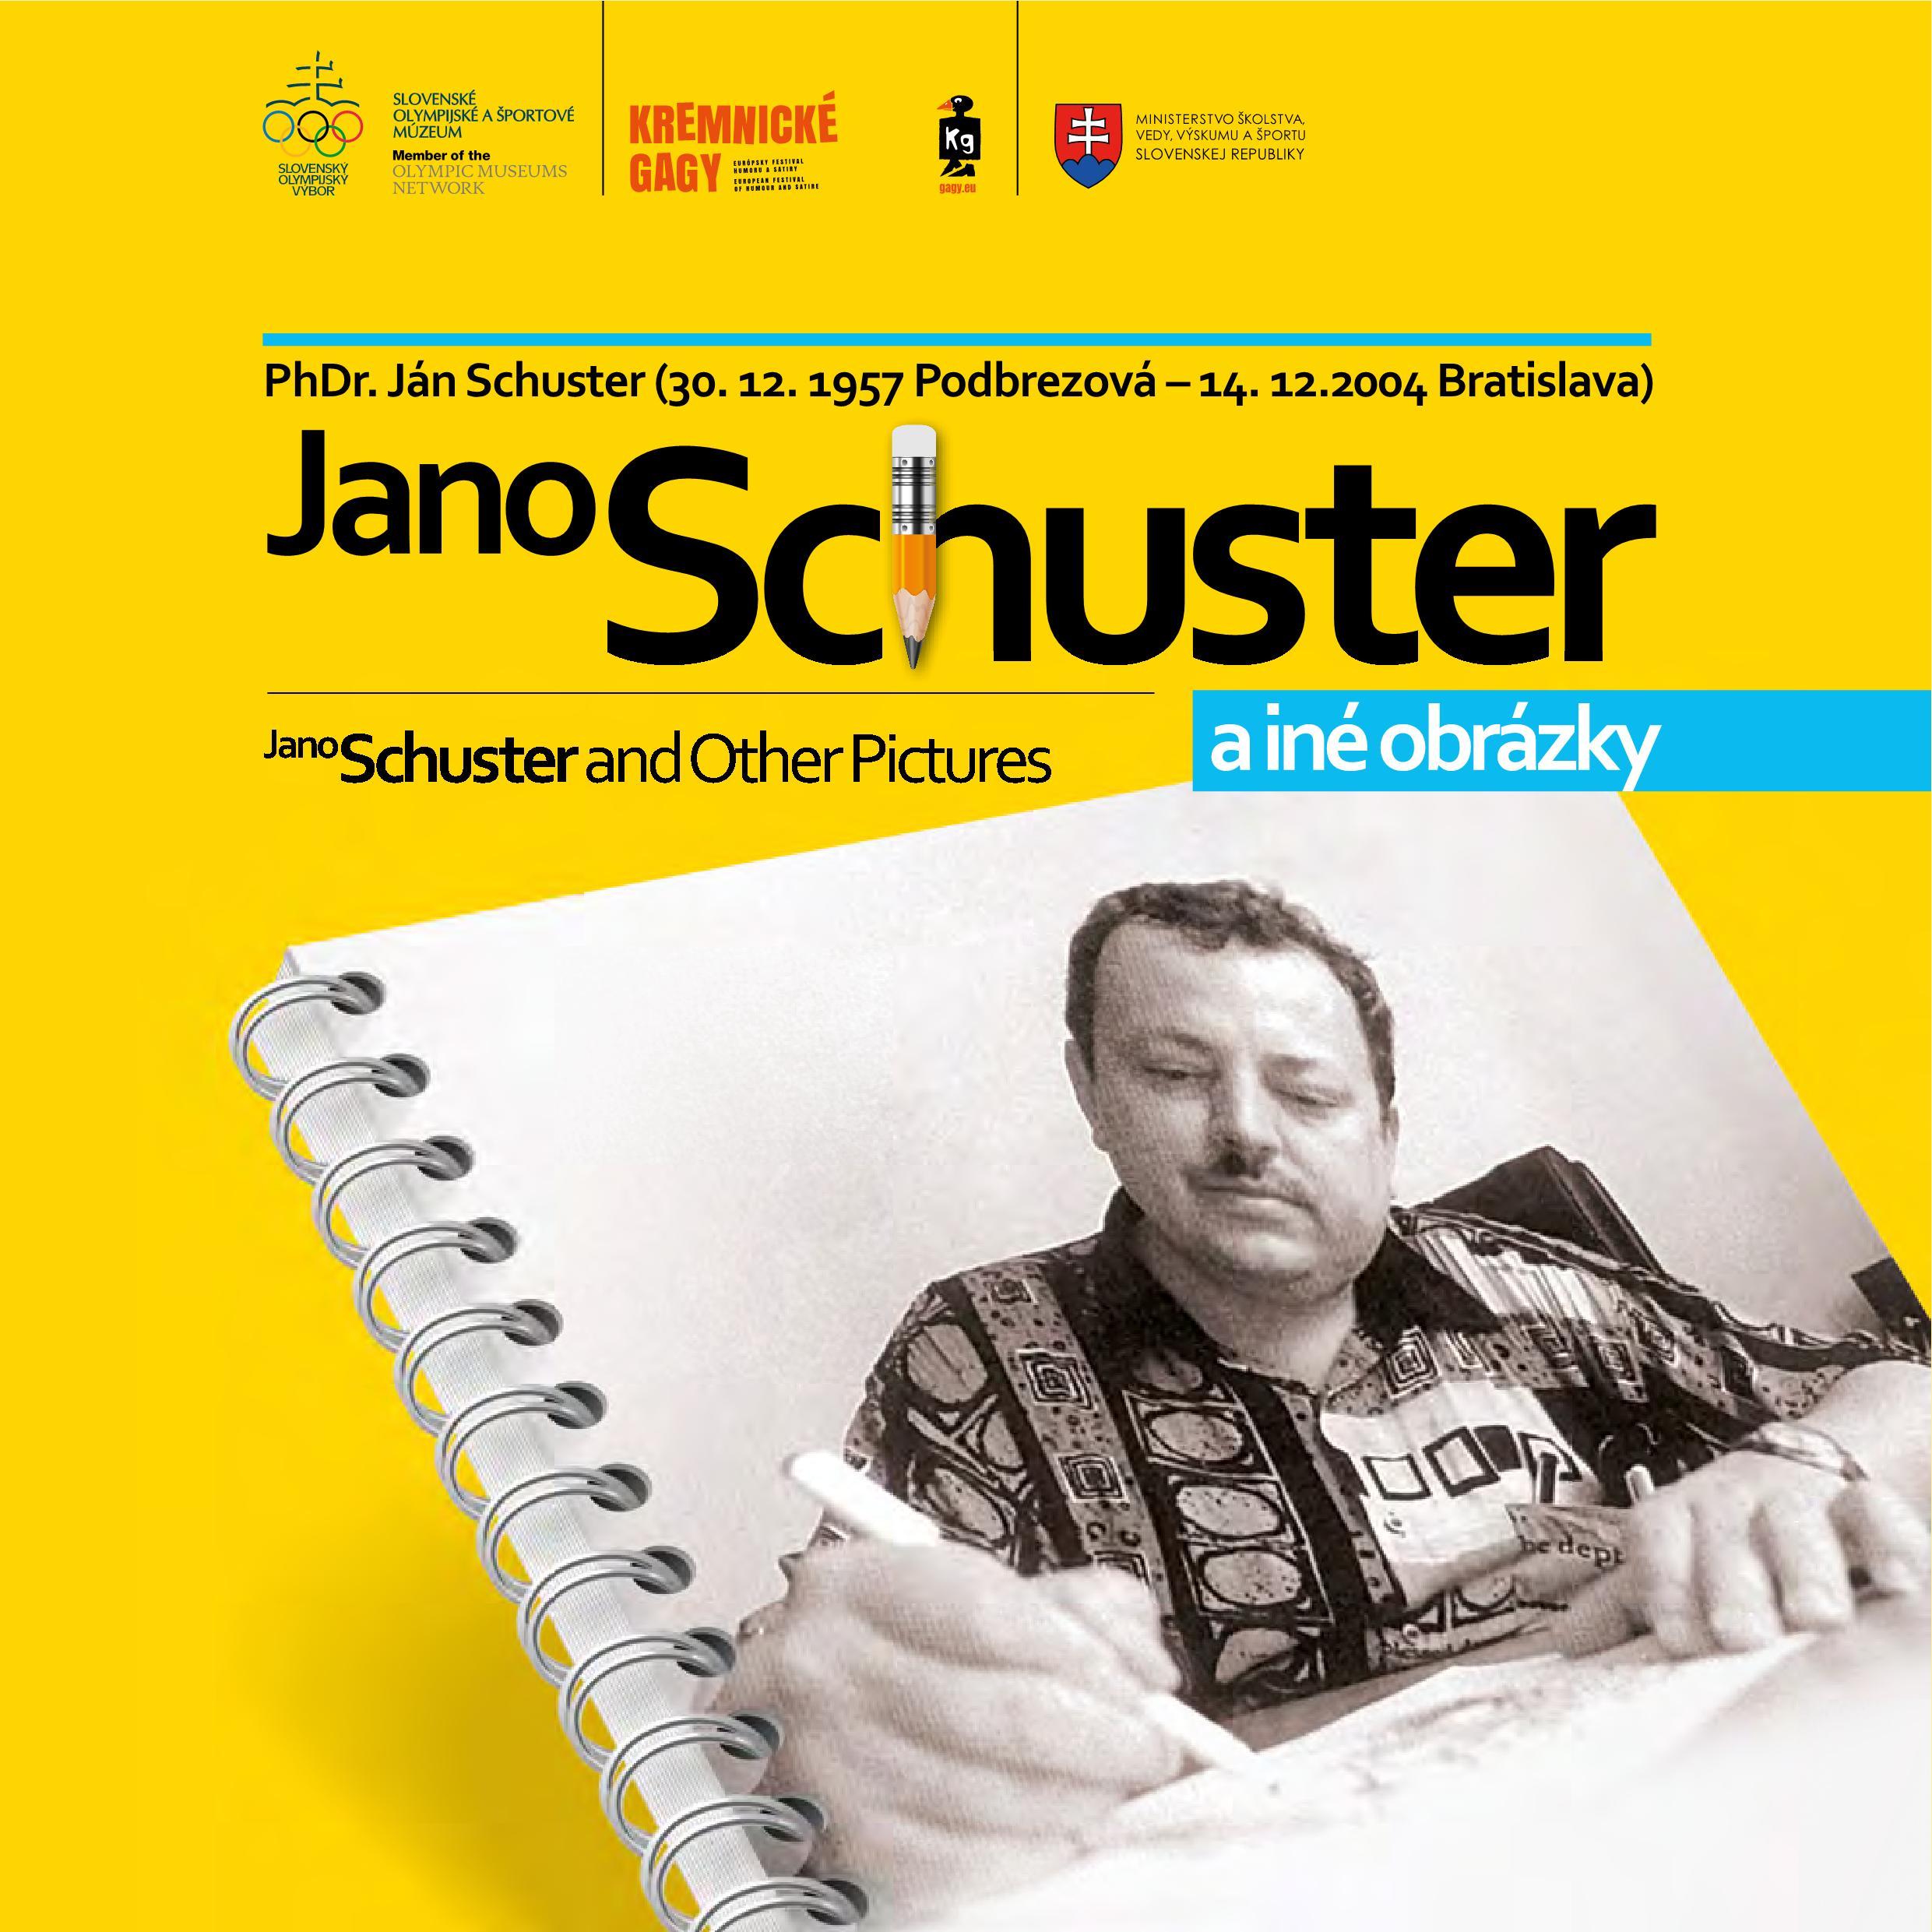 Jano-Schuster-a-ine-obrazky_1